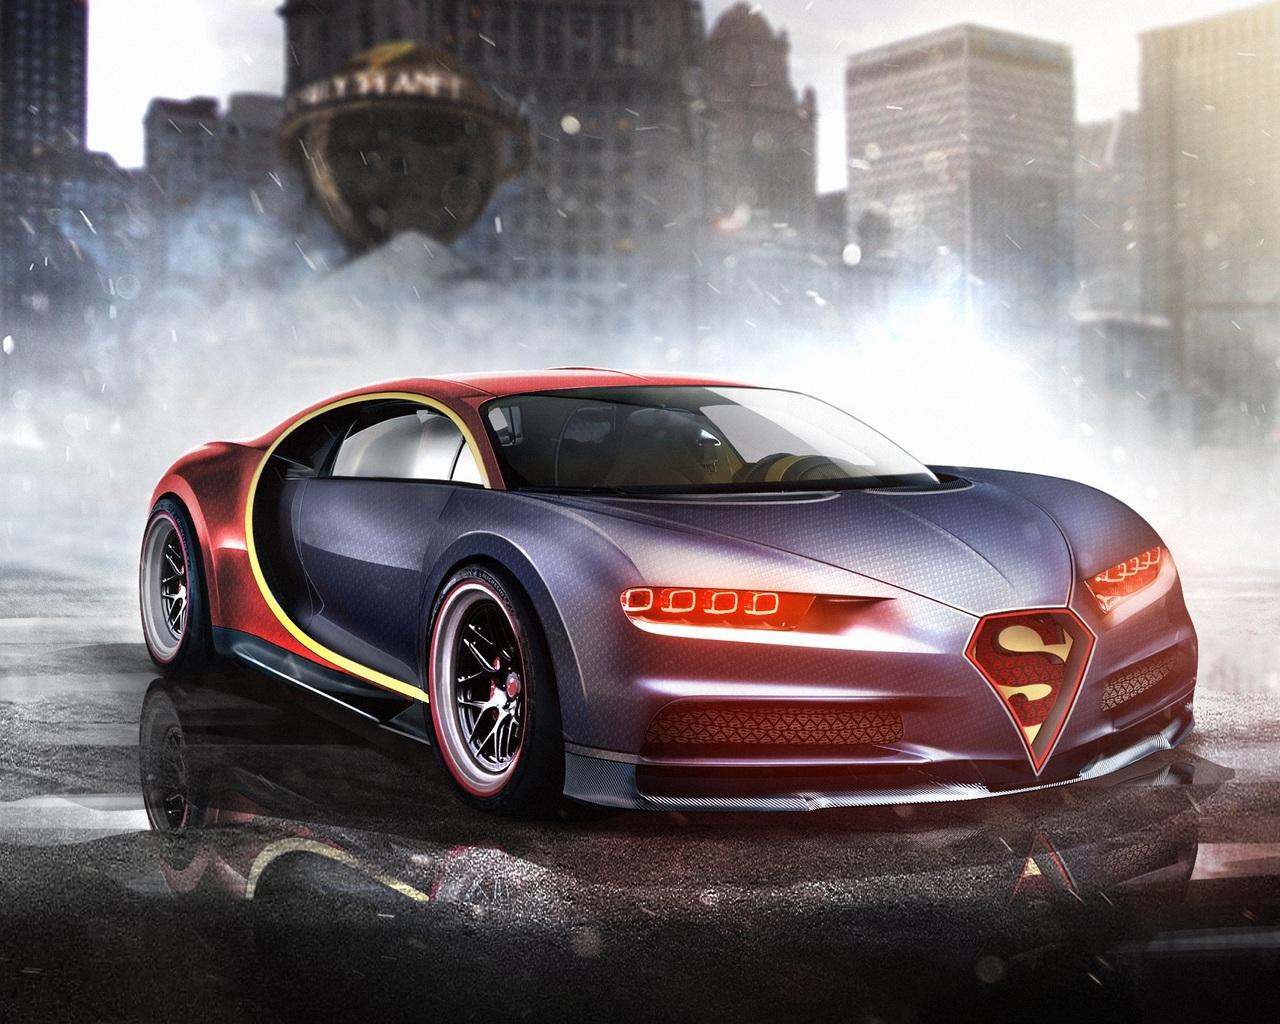 1280x1024 Bugatti Chiron Superman 1280x1024 Resolution Hd 4k